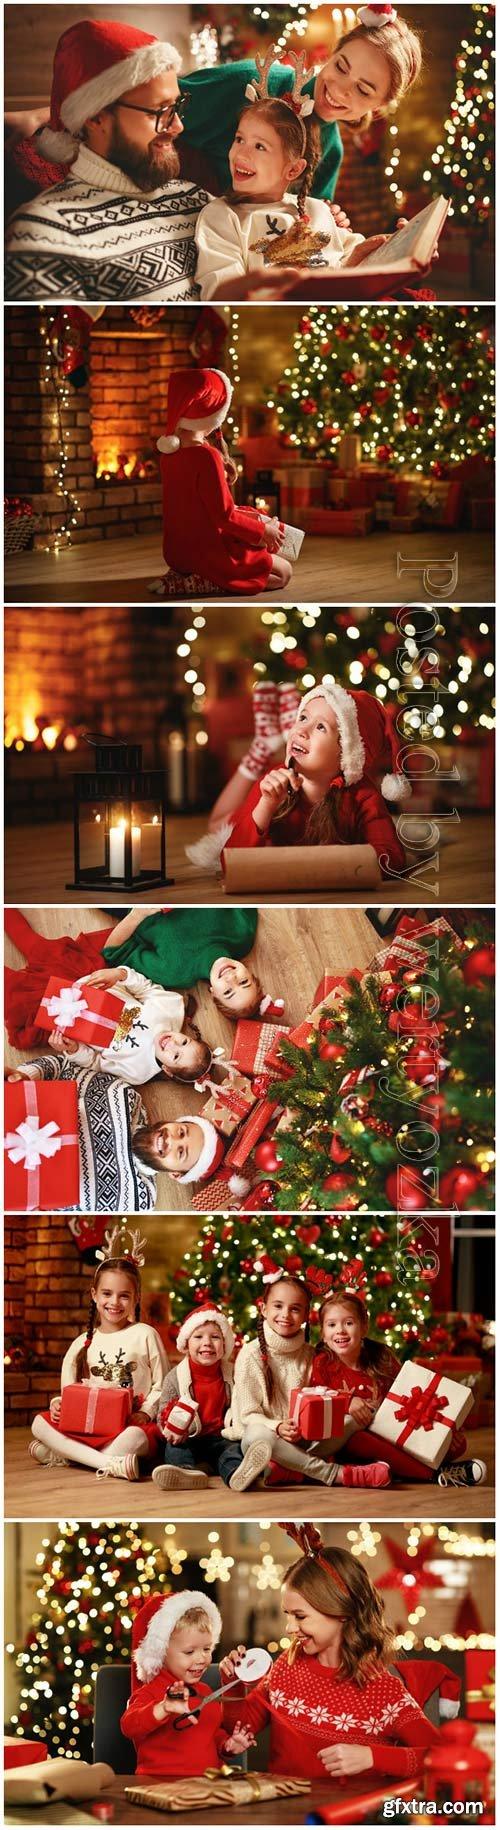 Family celebrates Christmas, New Year stock photo